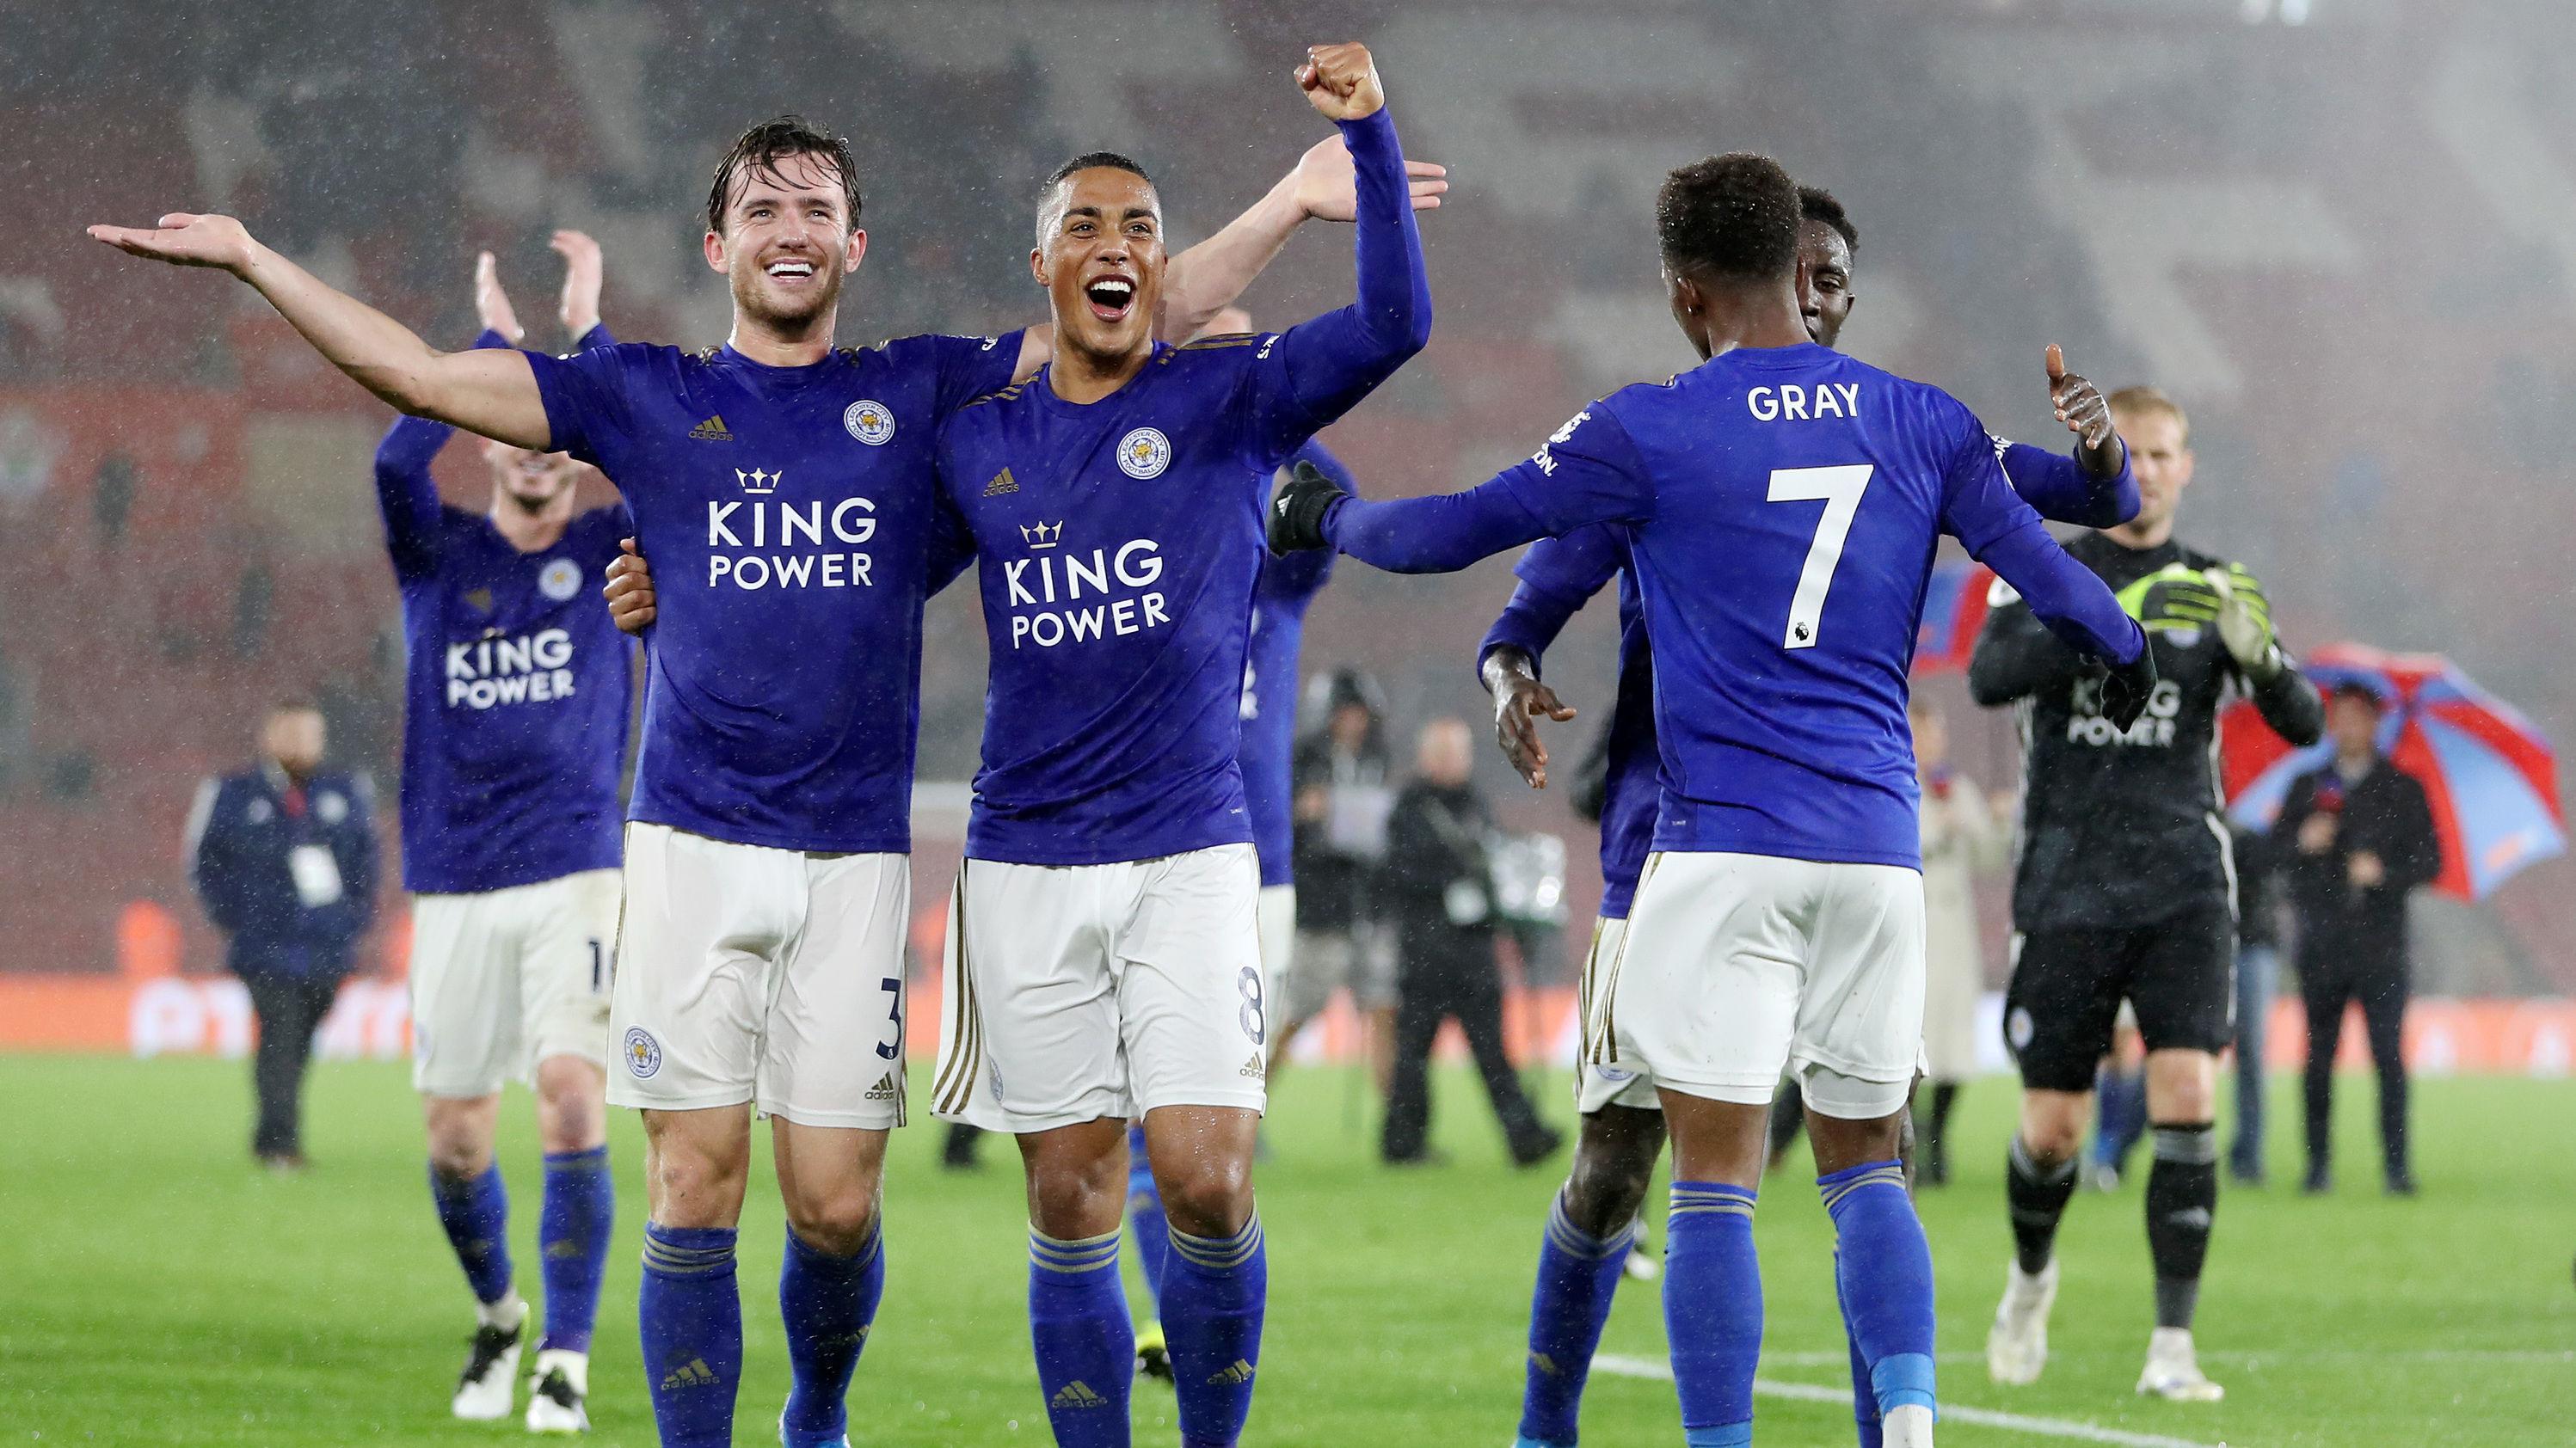 Premier League-England-Foxes-روباهها-لیگ برتر-انگلیس-لسترسیتی-Leicester City